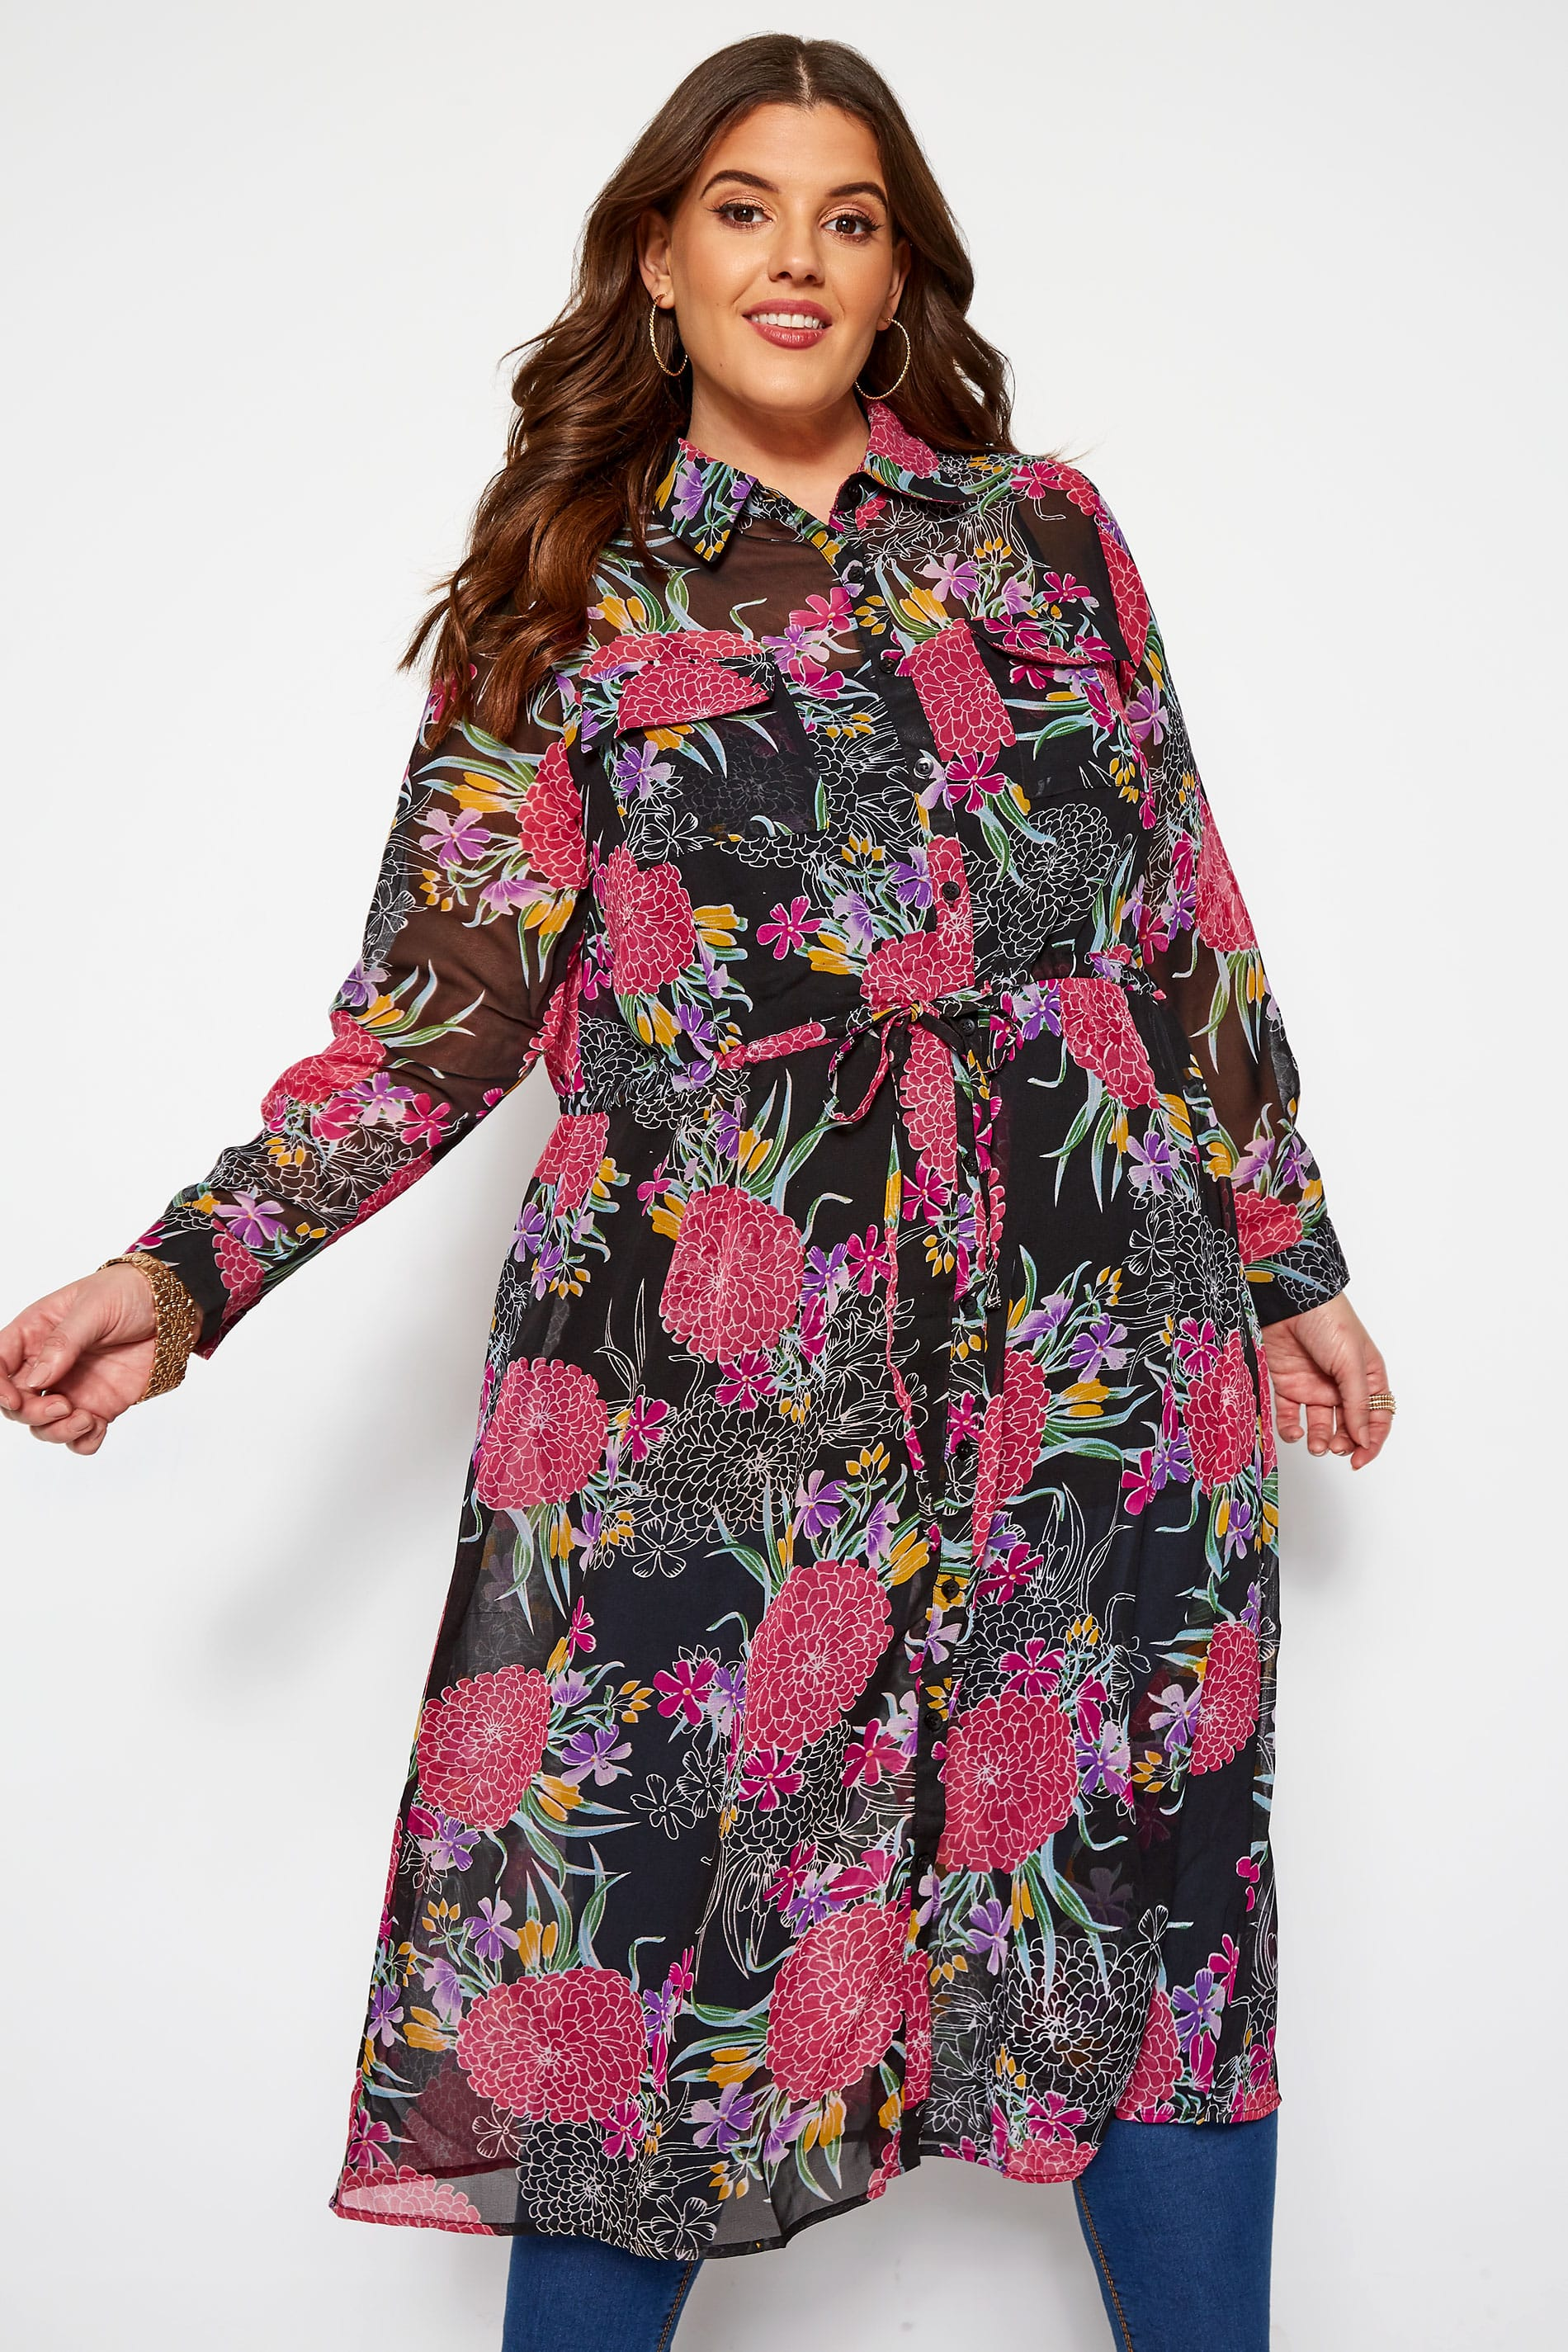 KOKO Black Floral Chiffon Shirt Dress